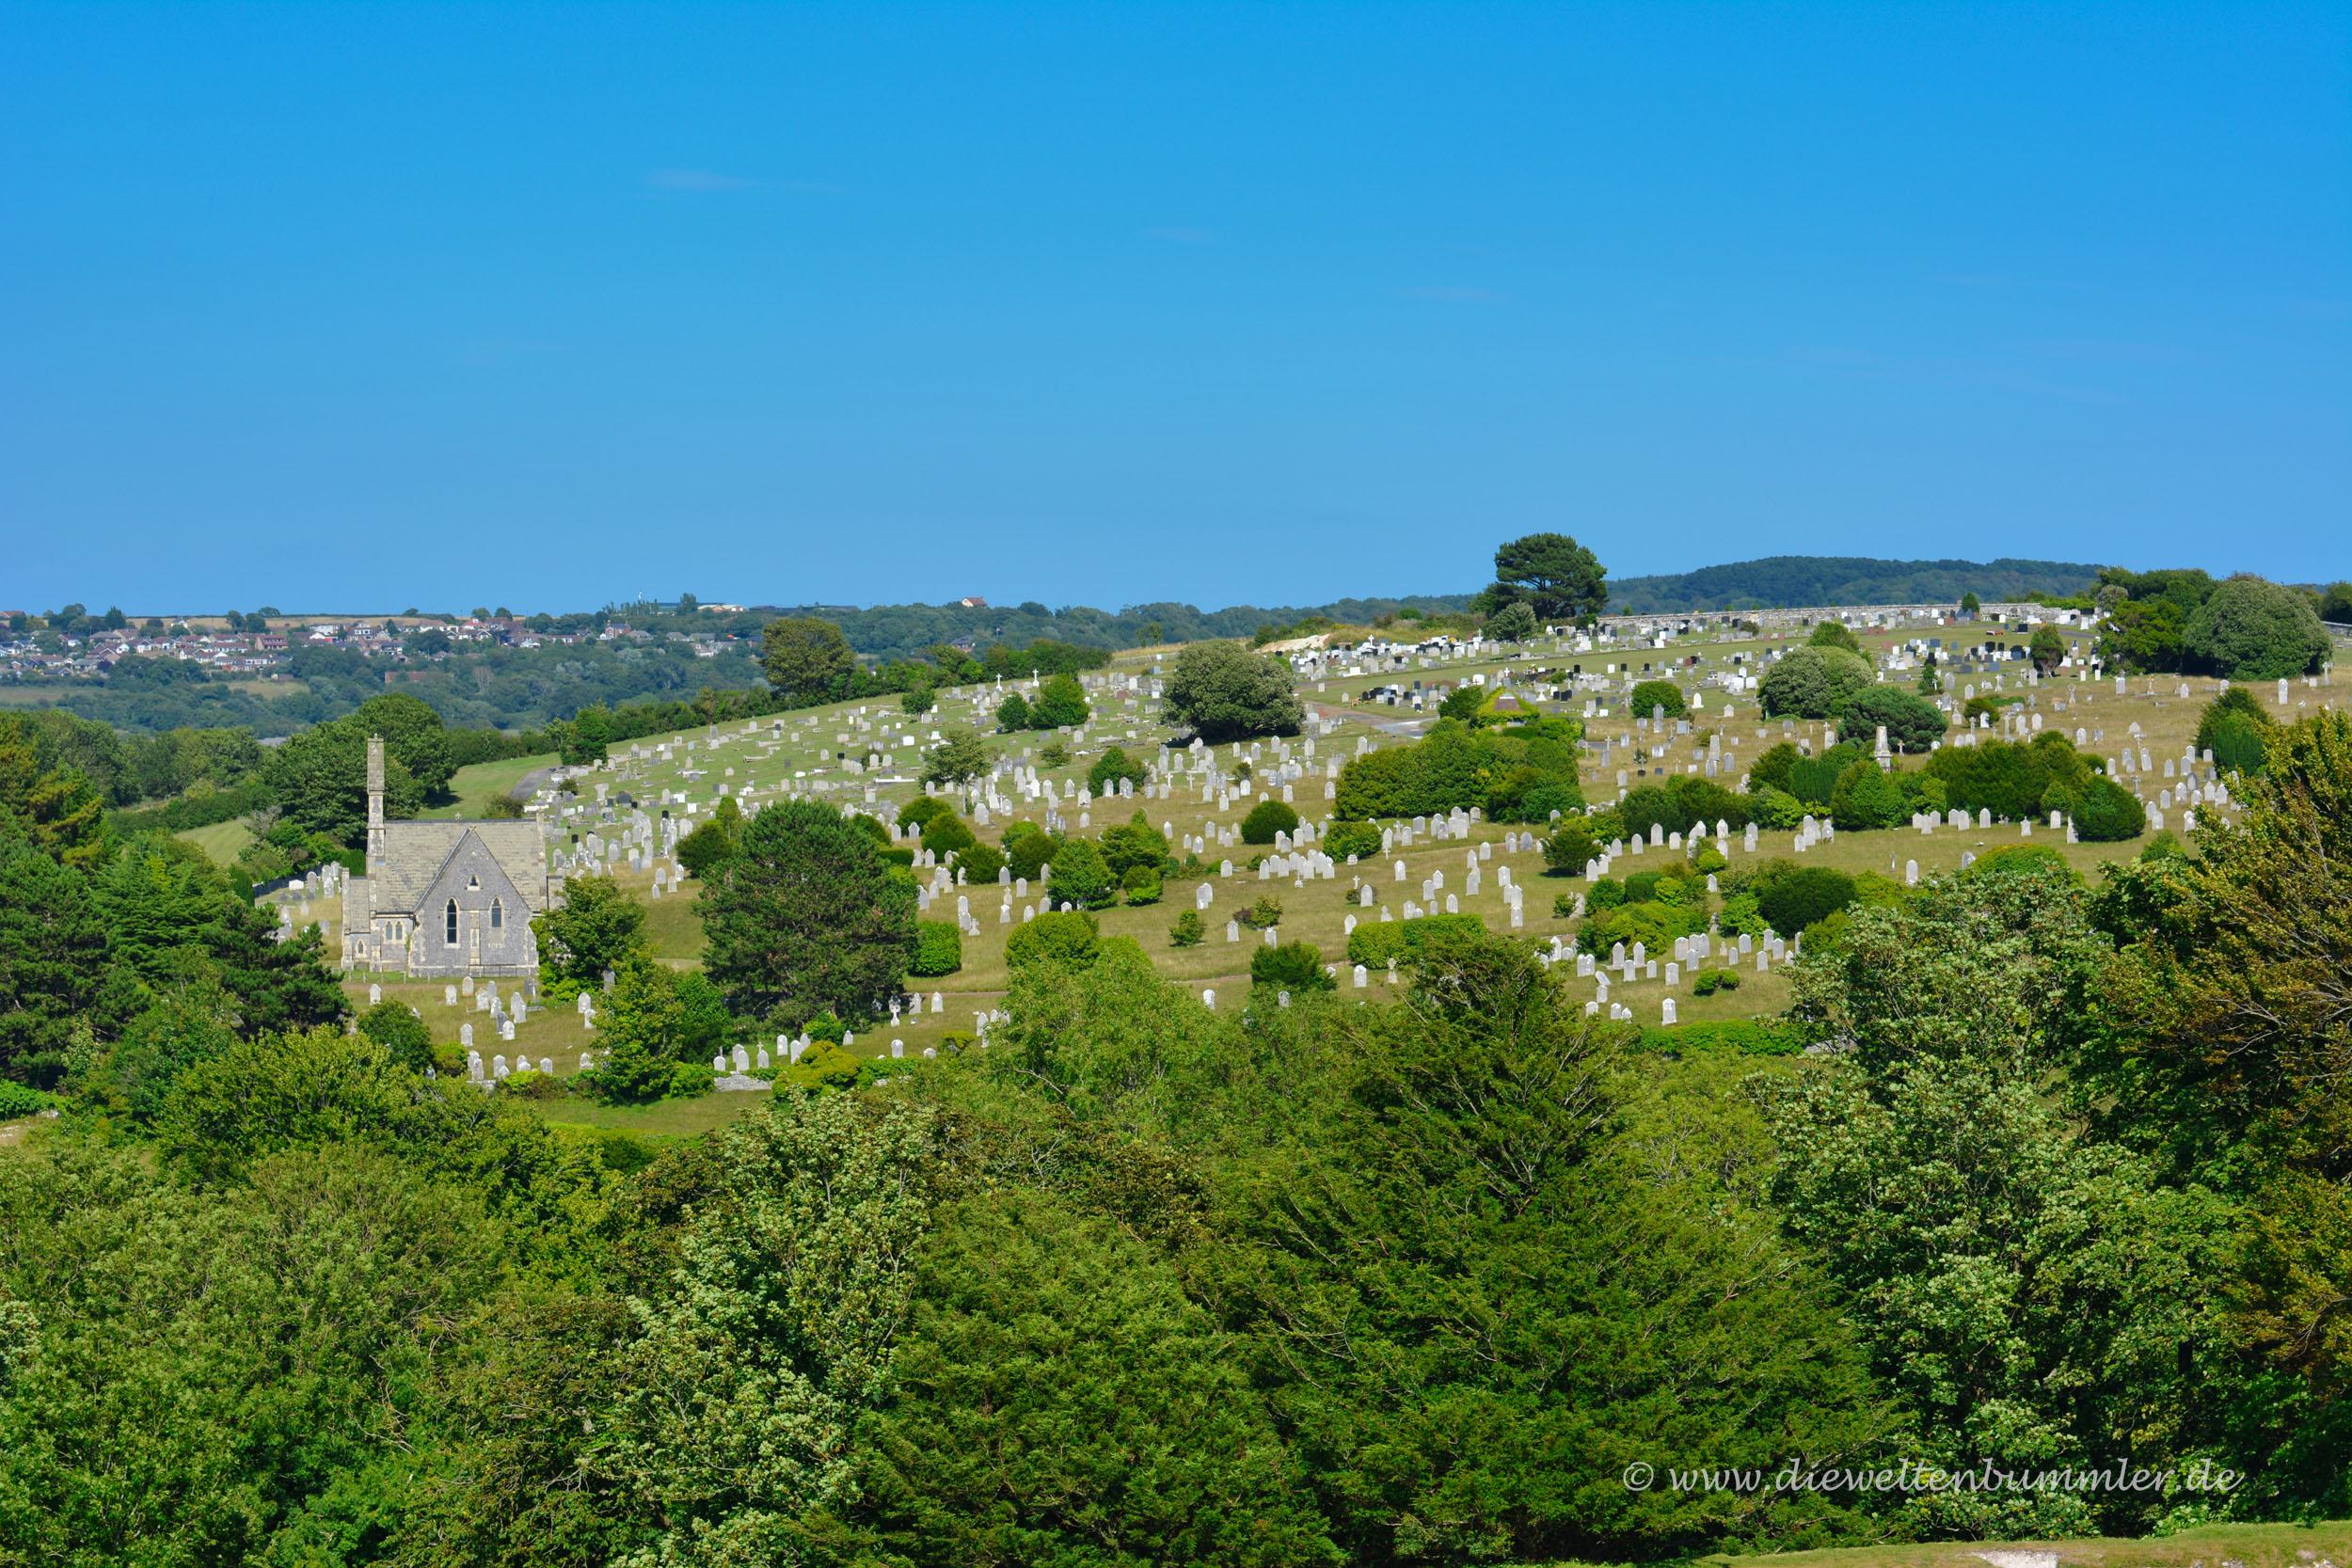 Hügel mit Friedhof